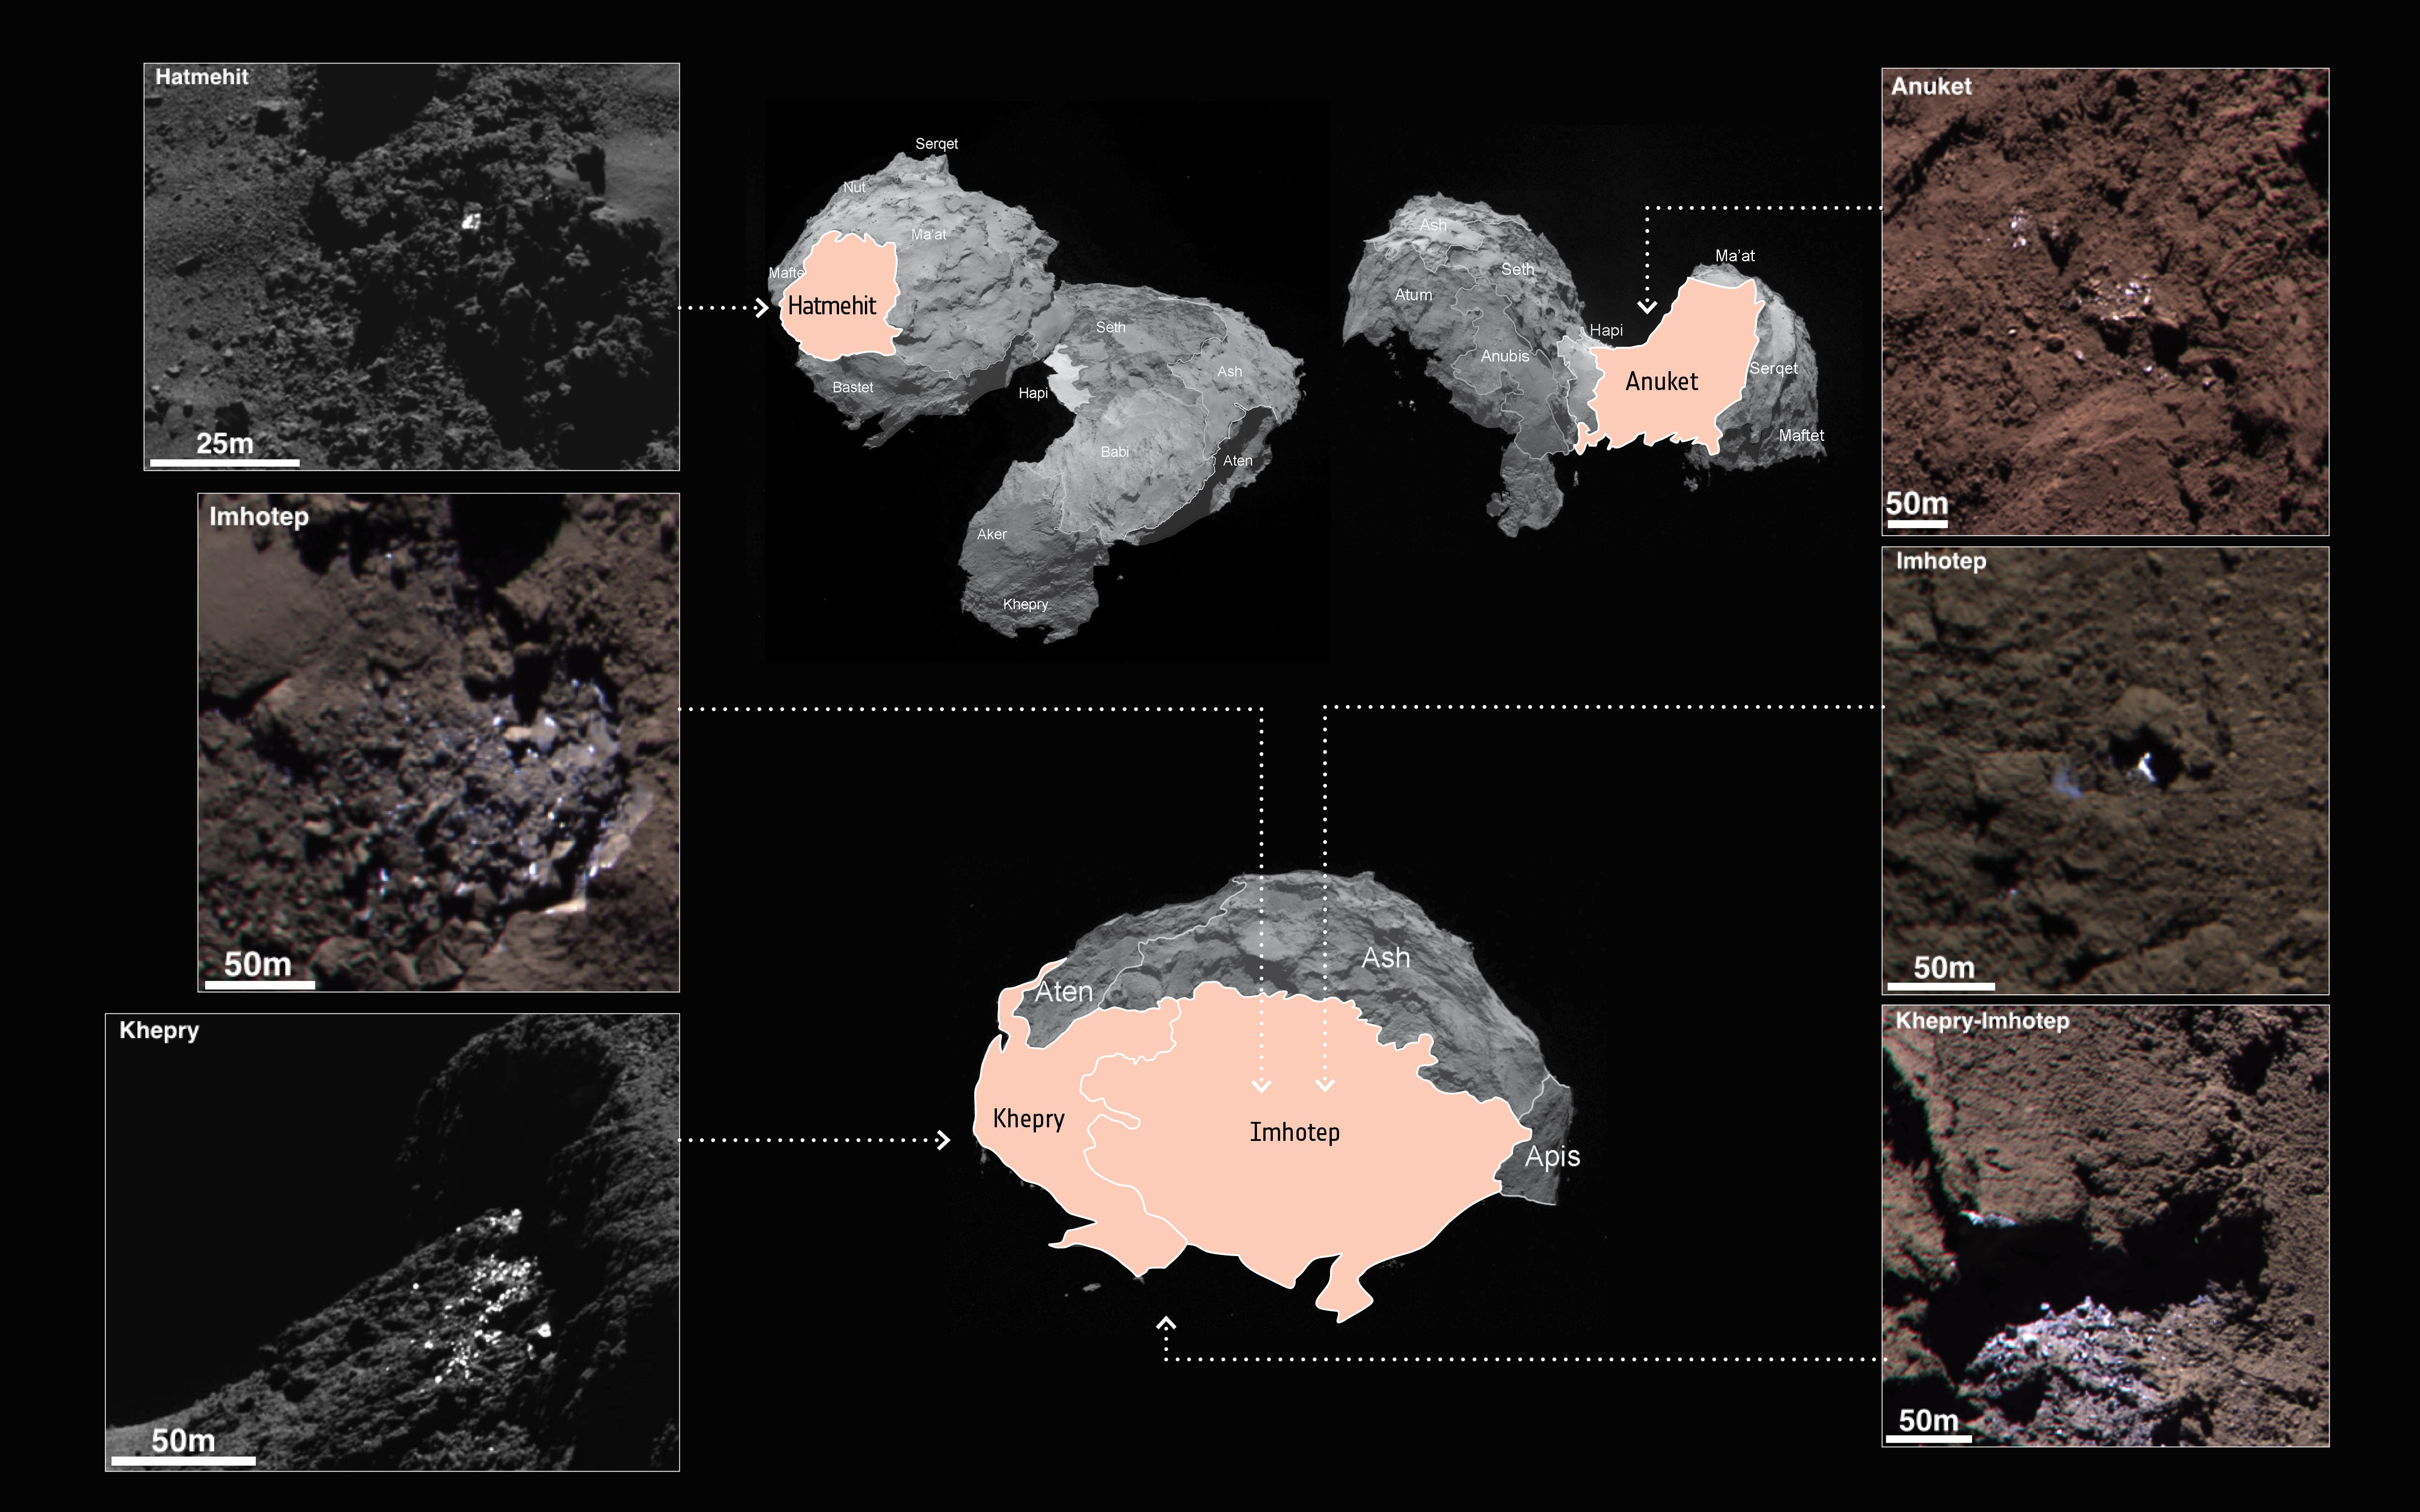 Map of different terrain types of comet Churyumov-Gerasimenko. (Rosetta/European Space Agency)